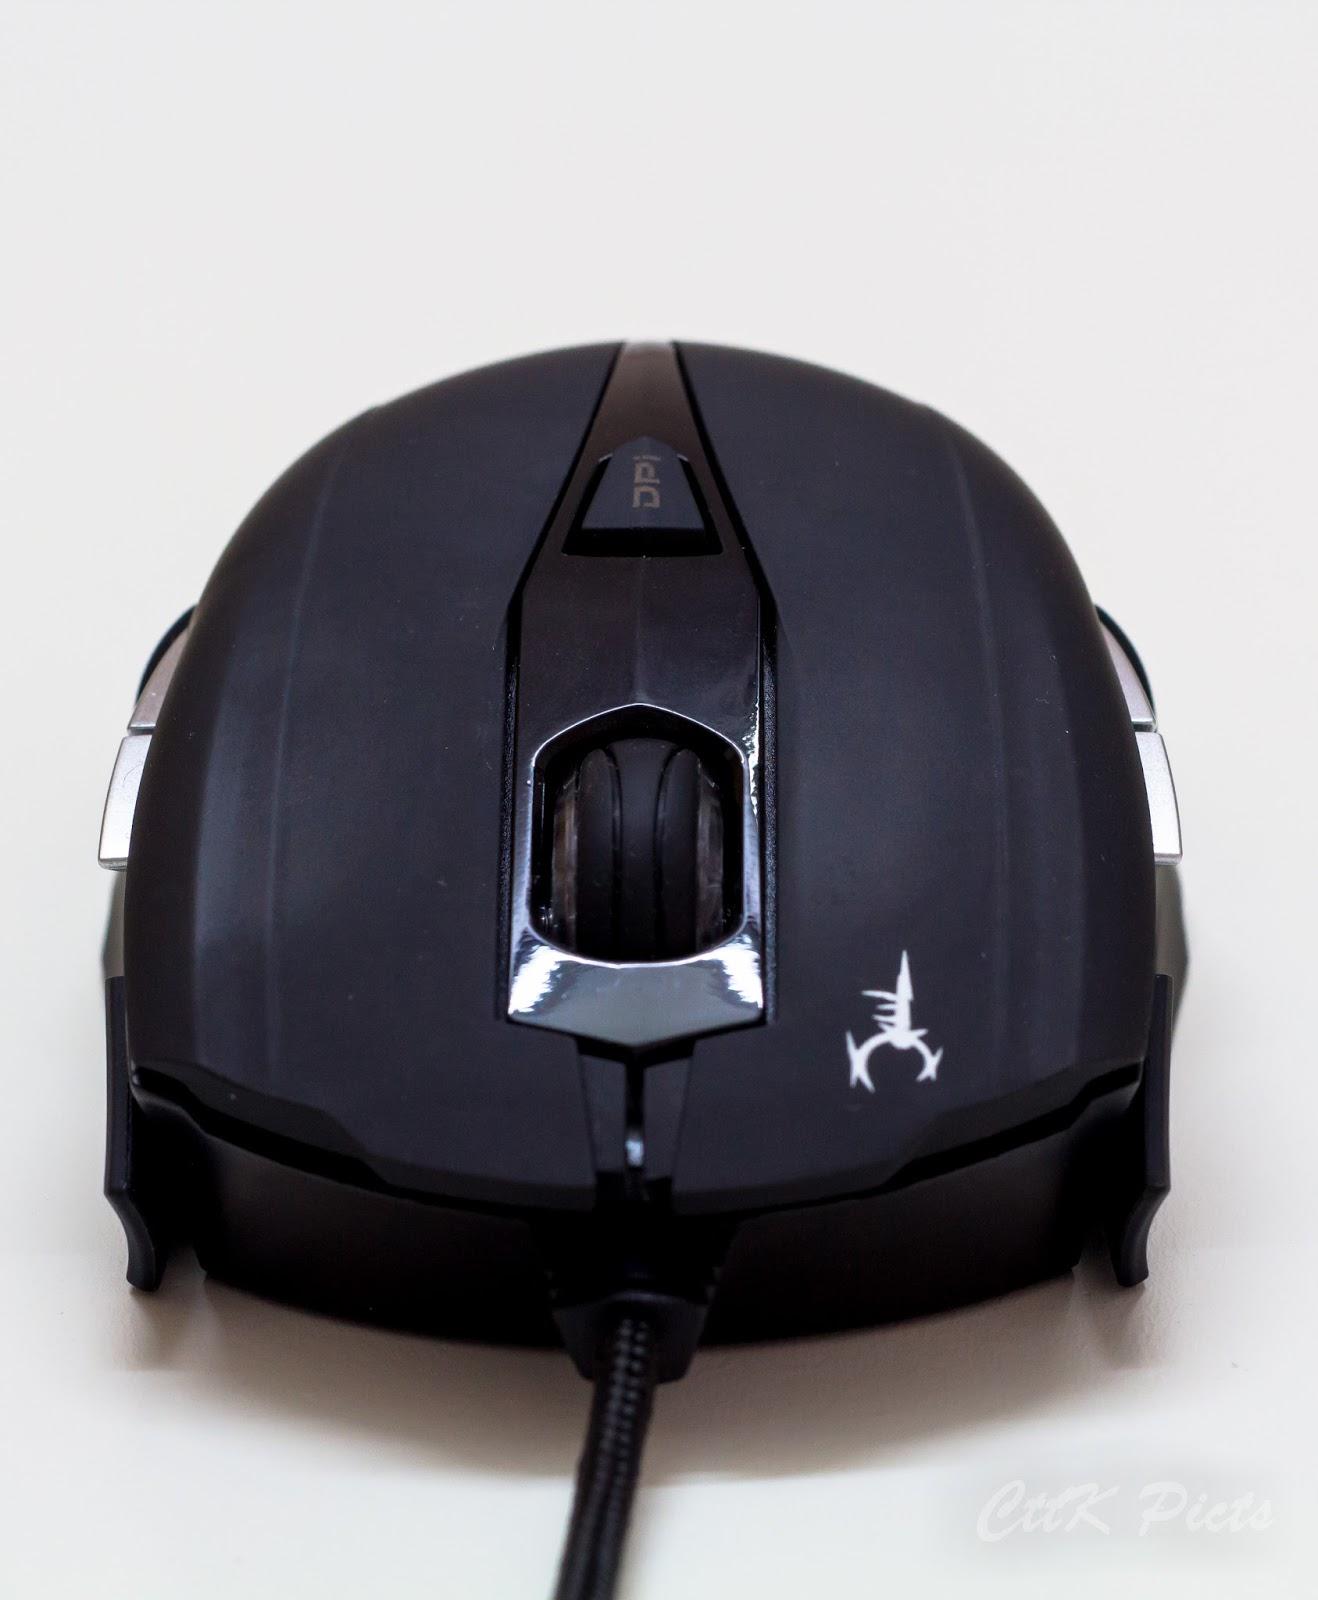 Gamdias Hades Extension Optical Gaming Mouse 61